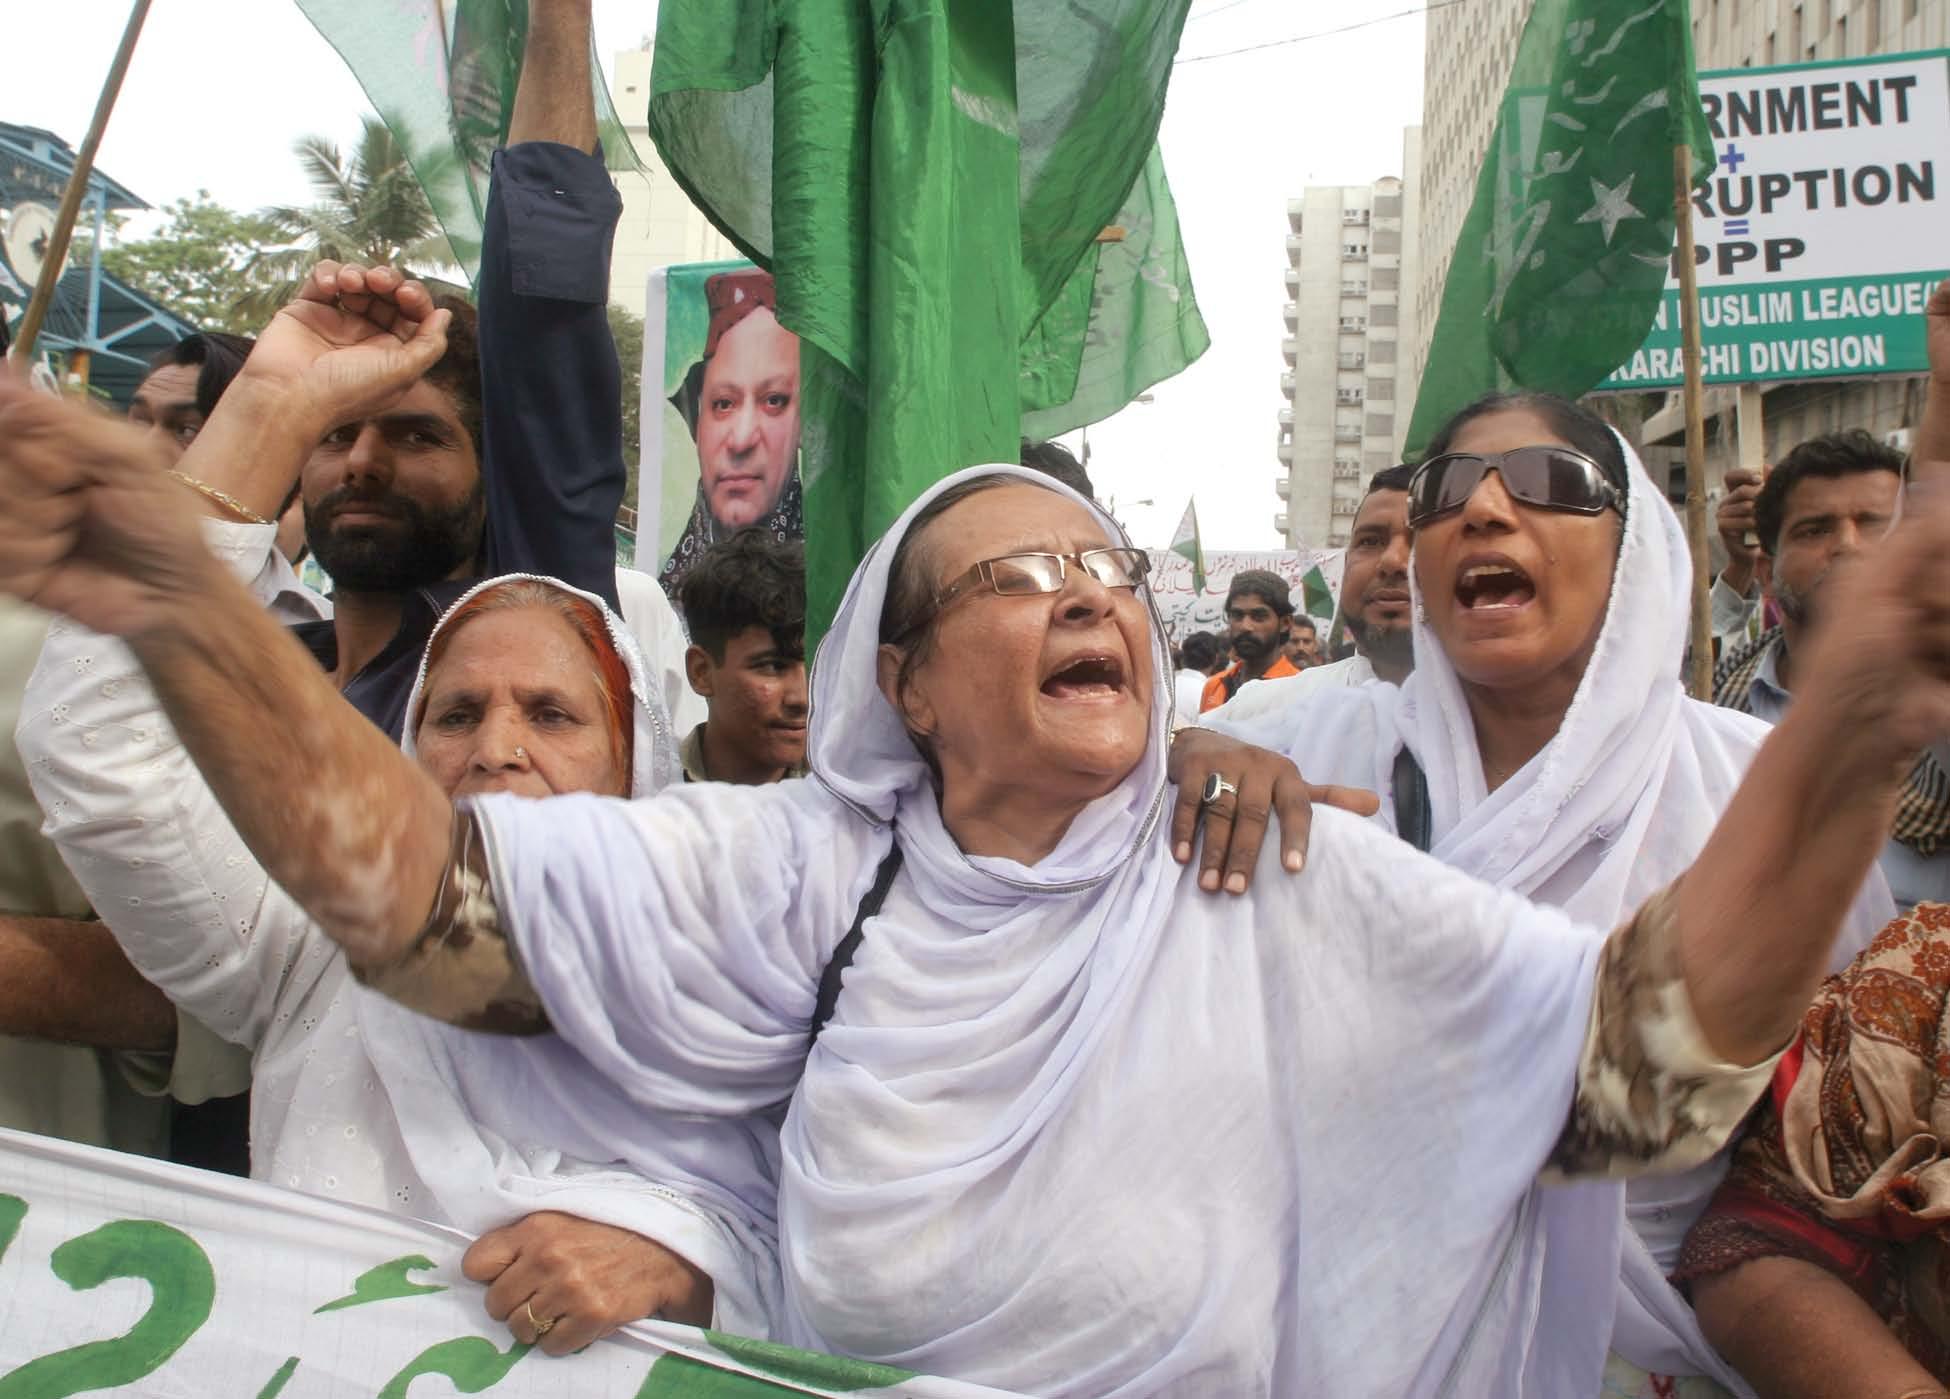 pml n wokers take part in the rally in karachi photo athar khan